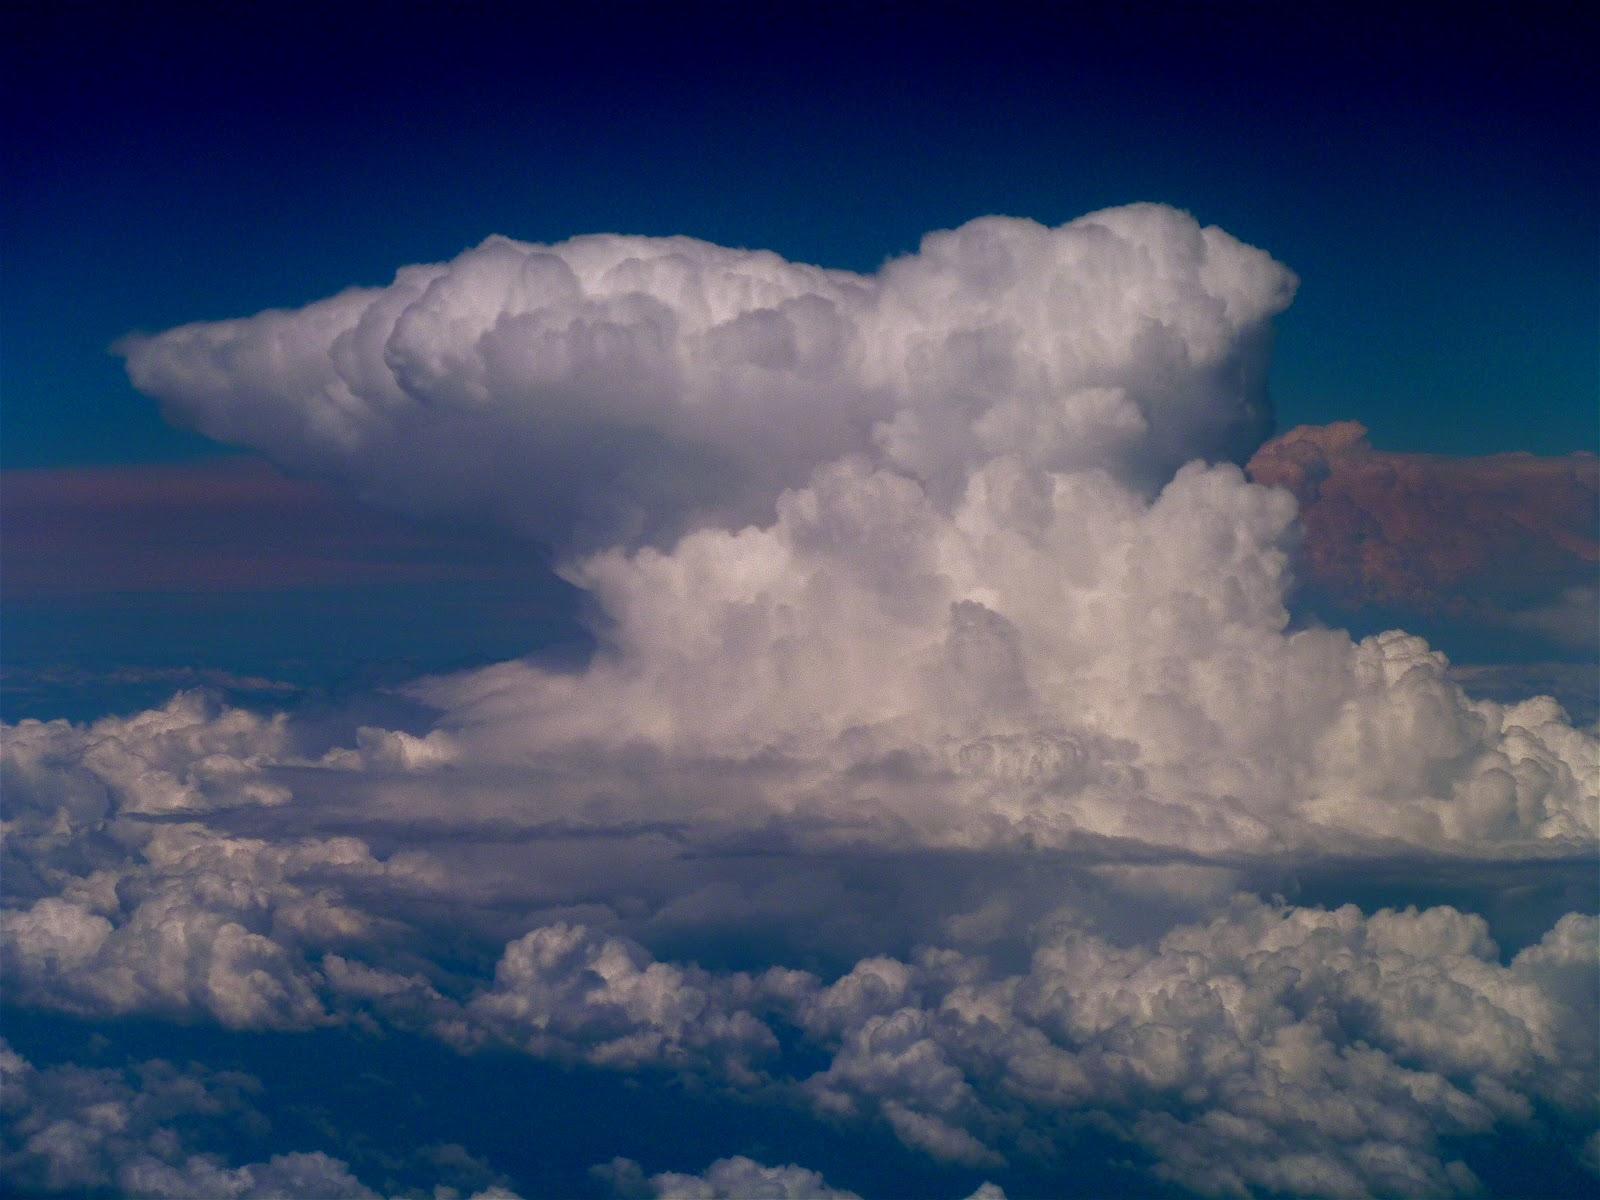 Cumulonimbus incus clouds, or in other words, a Cumulonimbus cloud ...